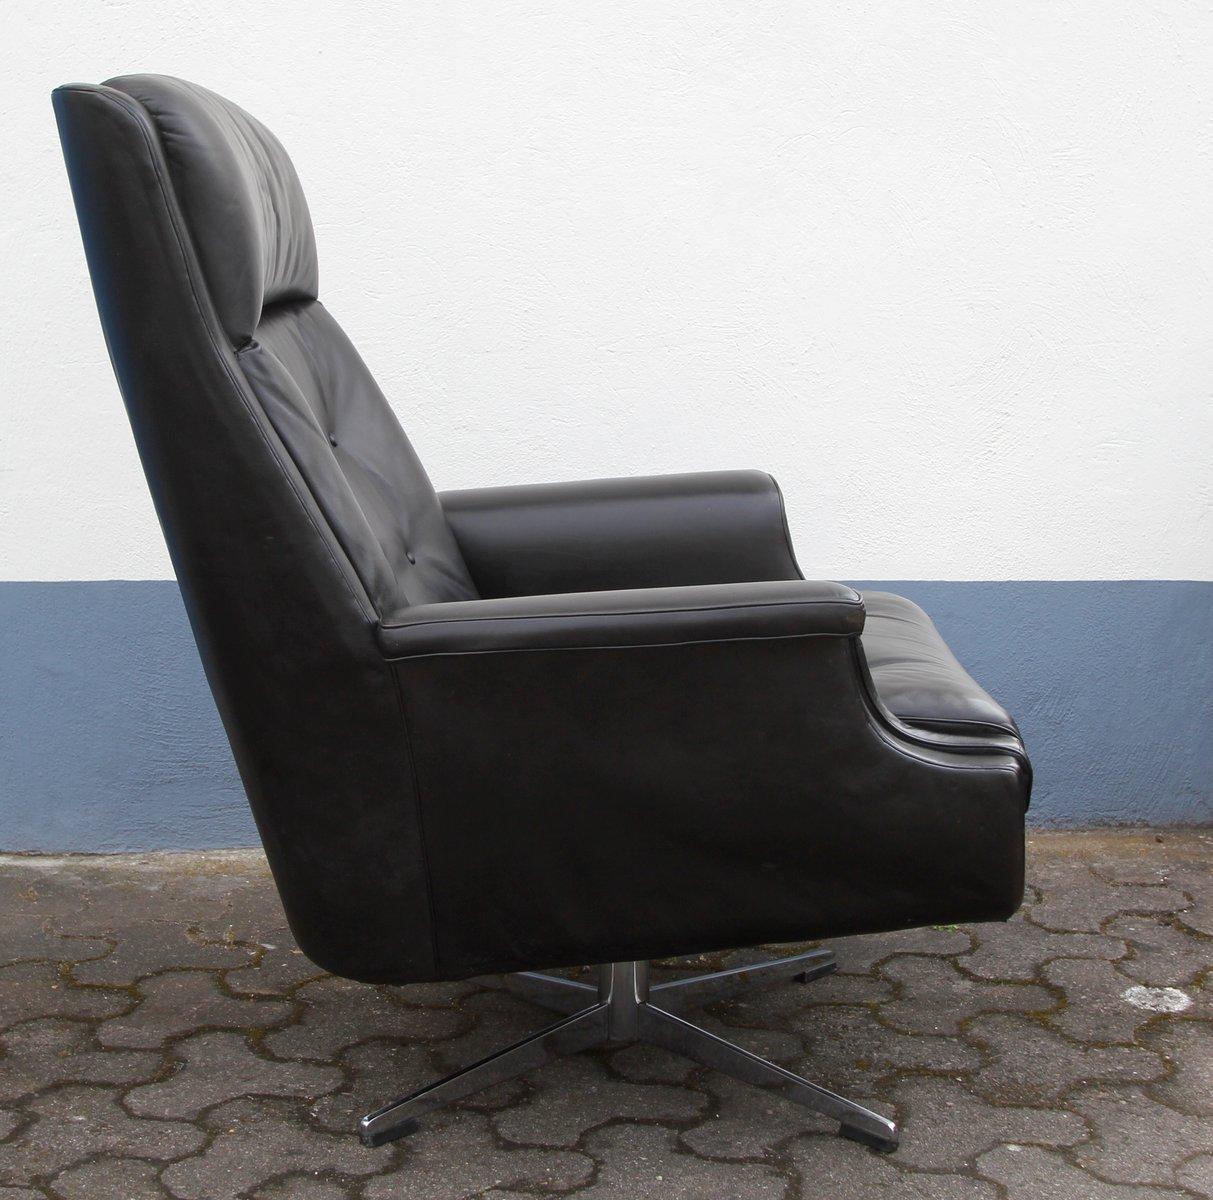 Grand fauteuil en cuir 1960s en vente sur pamono - Fauteuil cuir belgique ...